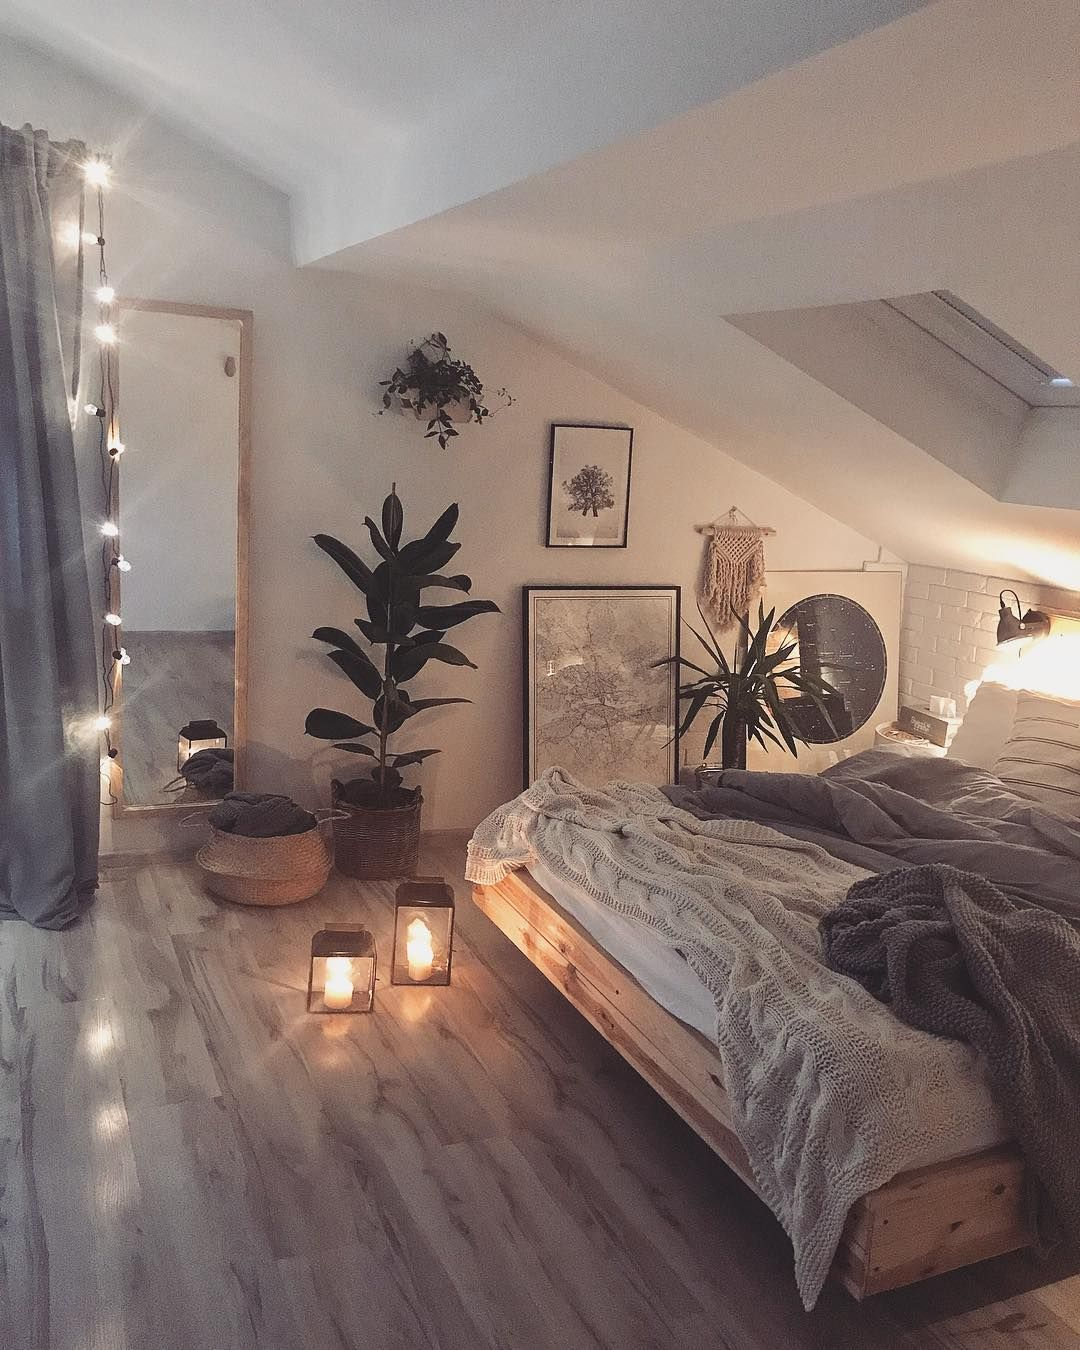 awesome and cozy bedroom interior design idea